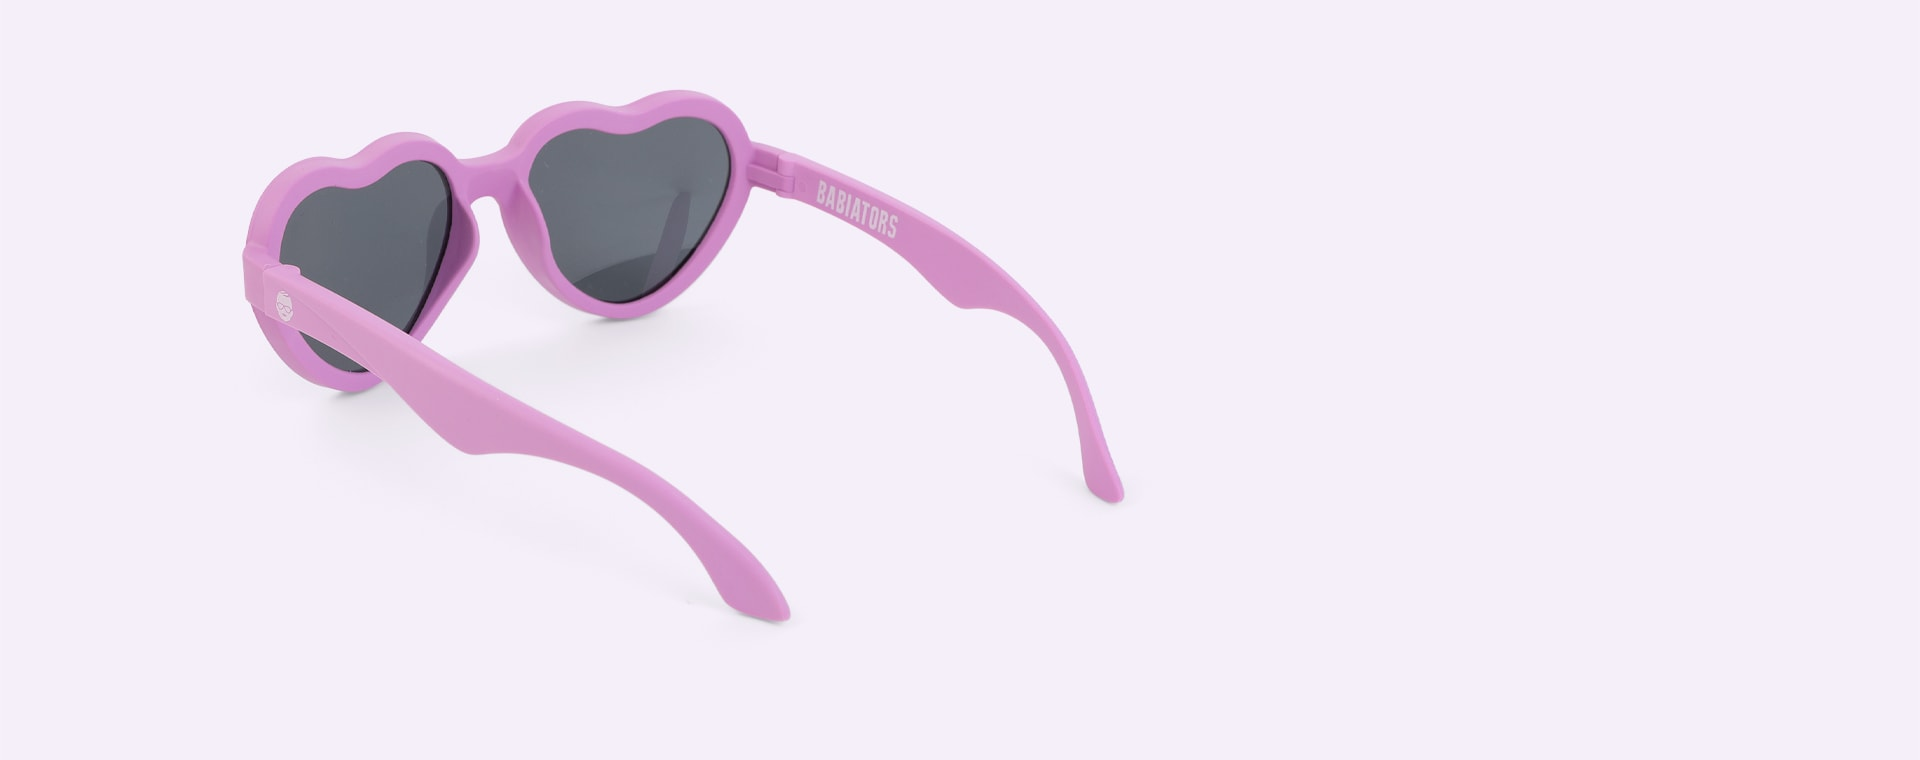 Oh La Lavendar Babiators Heart Sunglasses